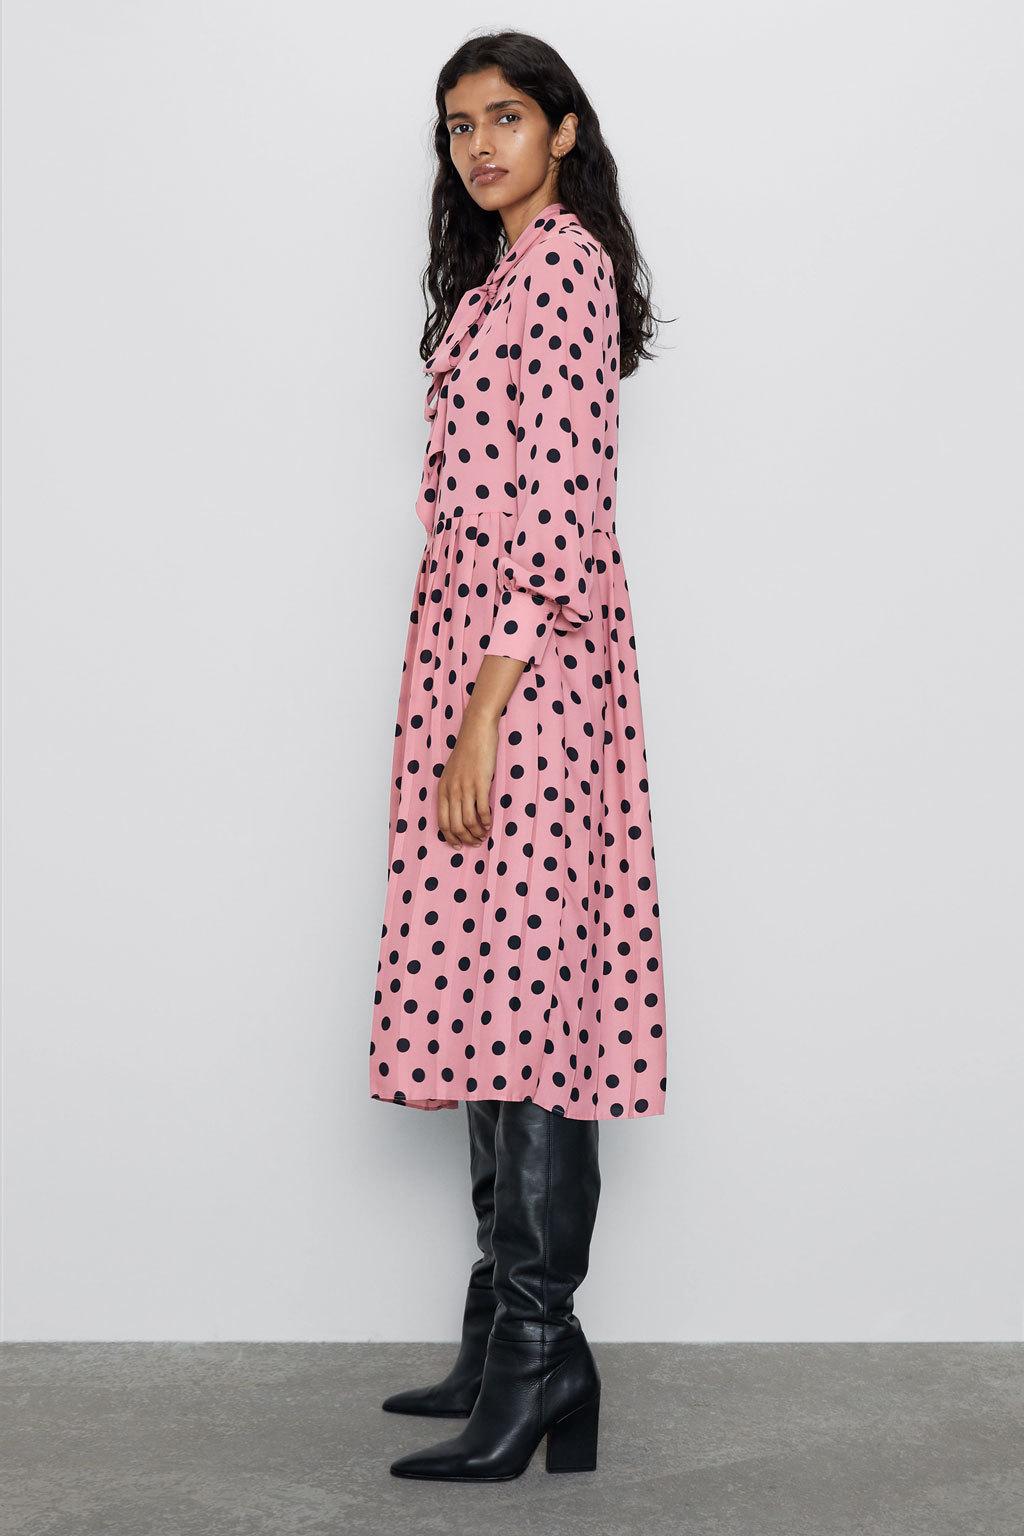 Wholesale New Women's Bow-Trim Polka Dot Pleated Dress NHAM186183